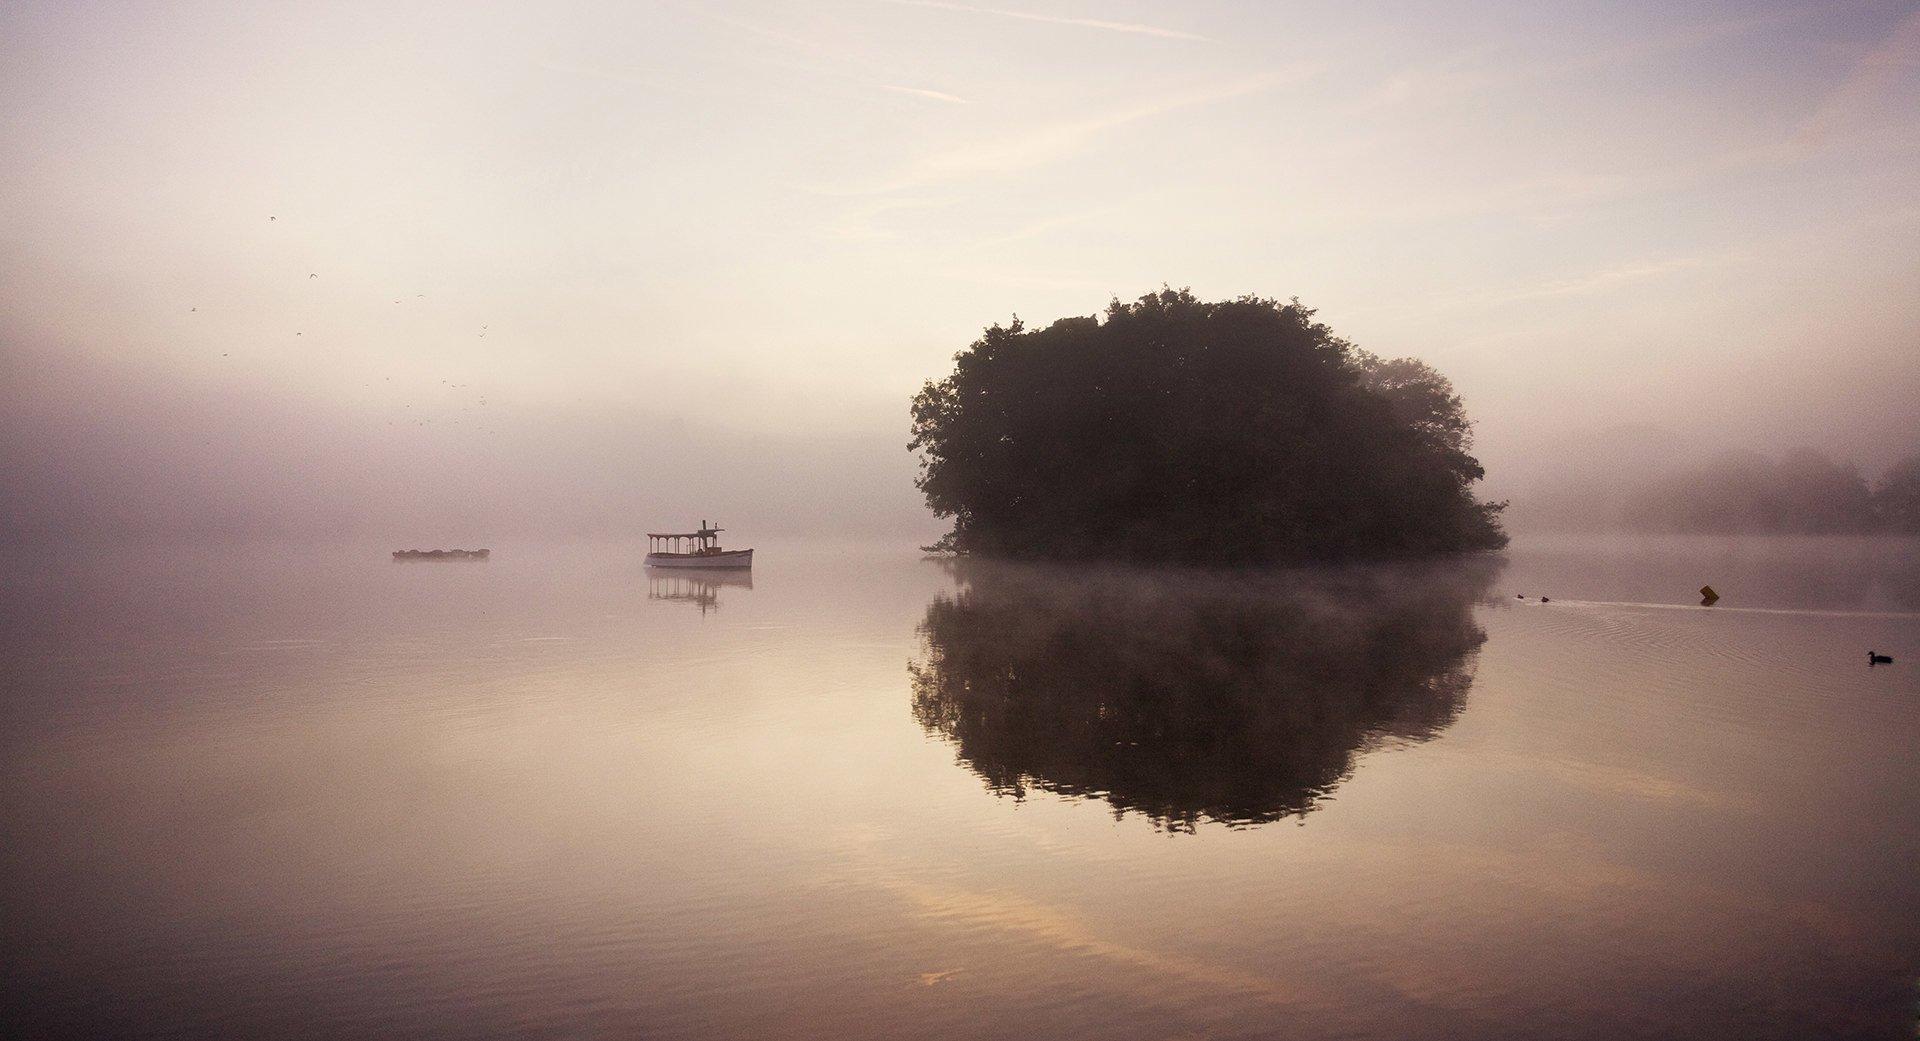 landscape photography 5